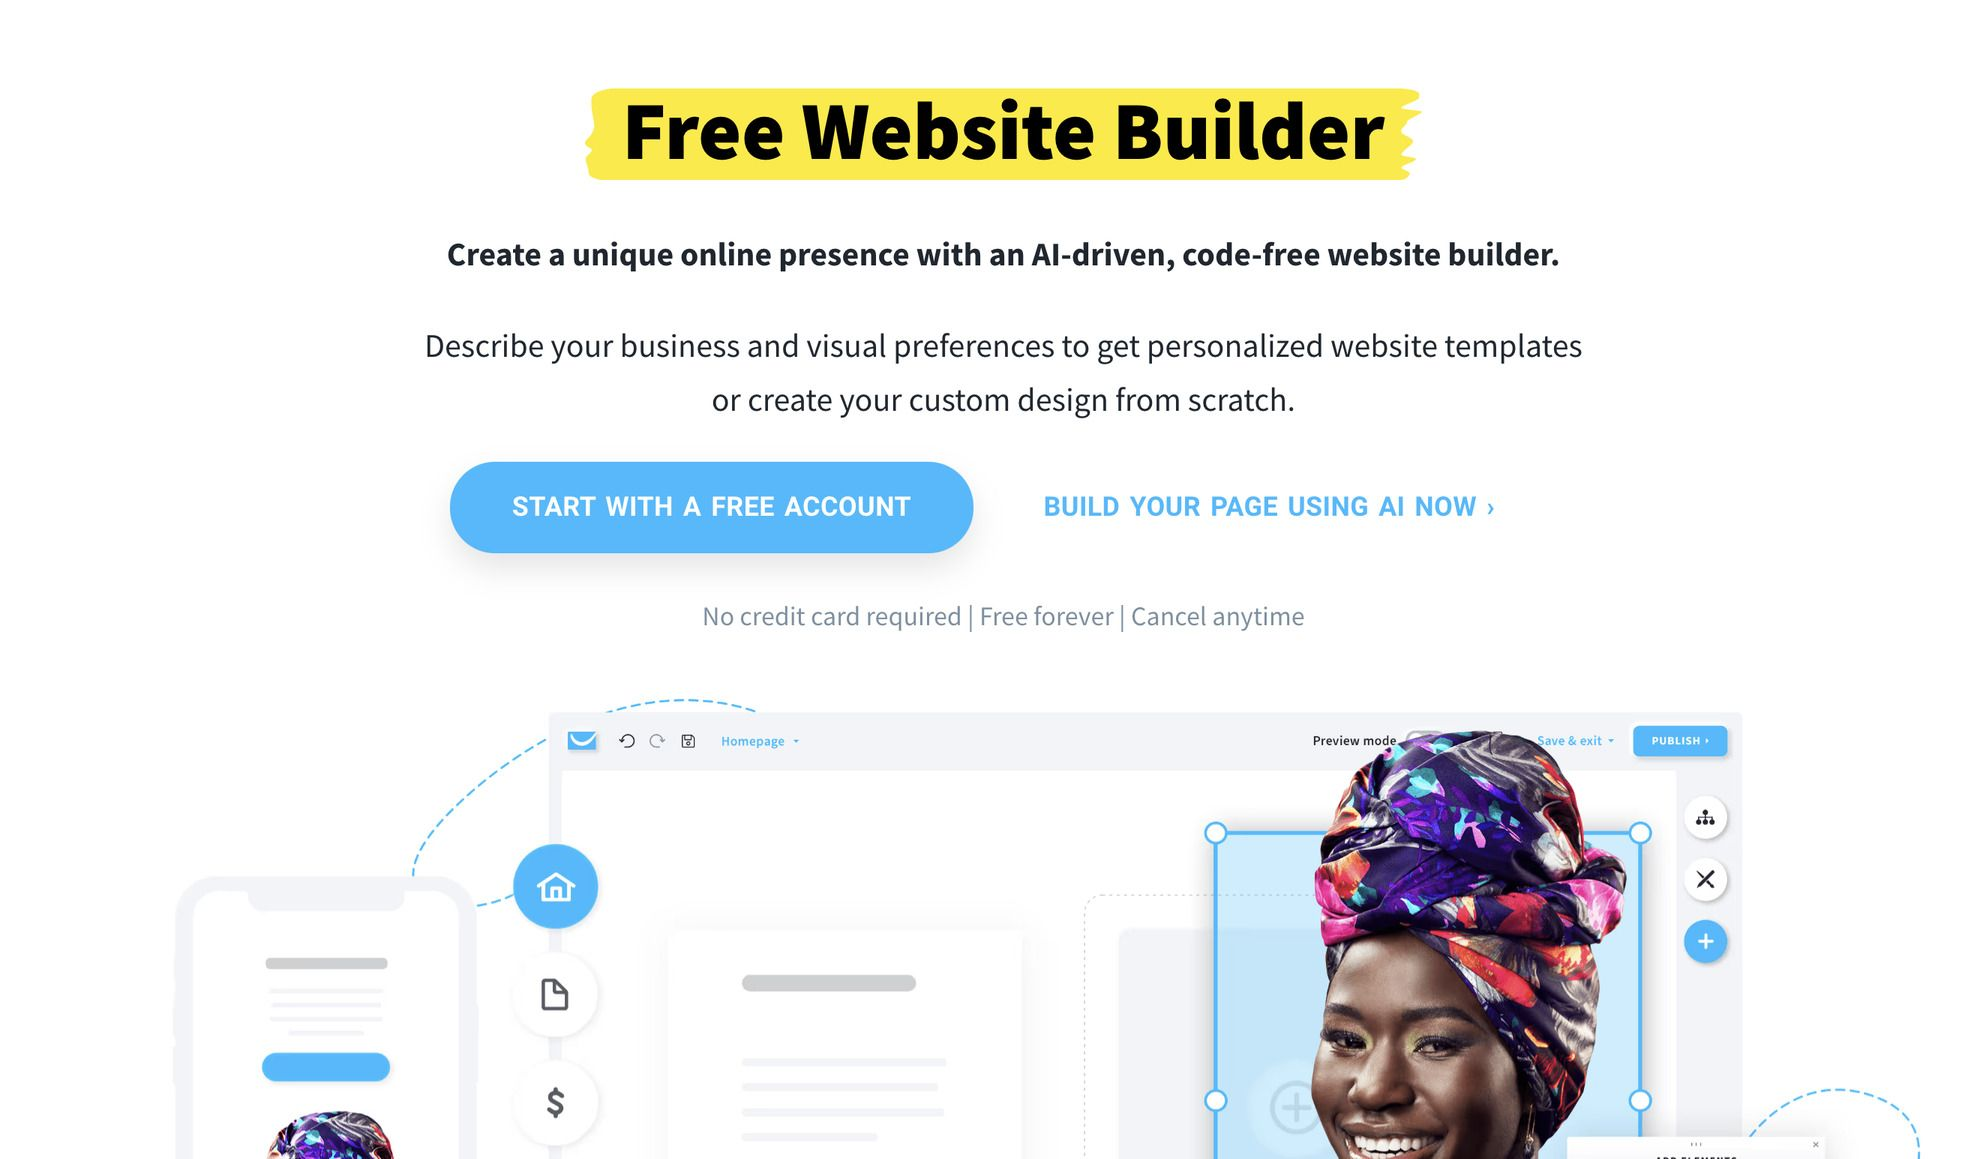 GetResponse Free Website Builder